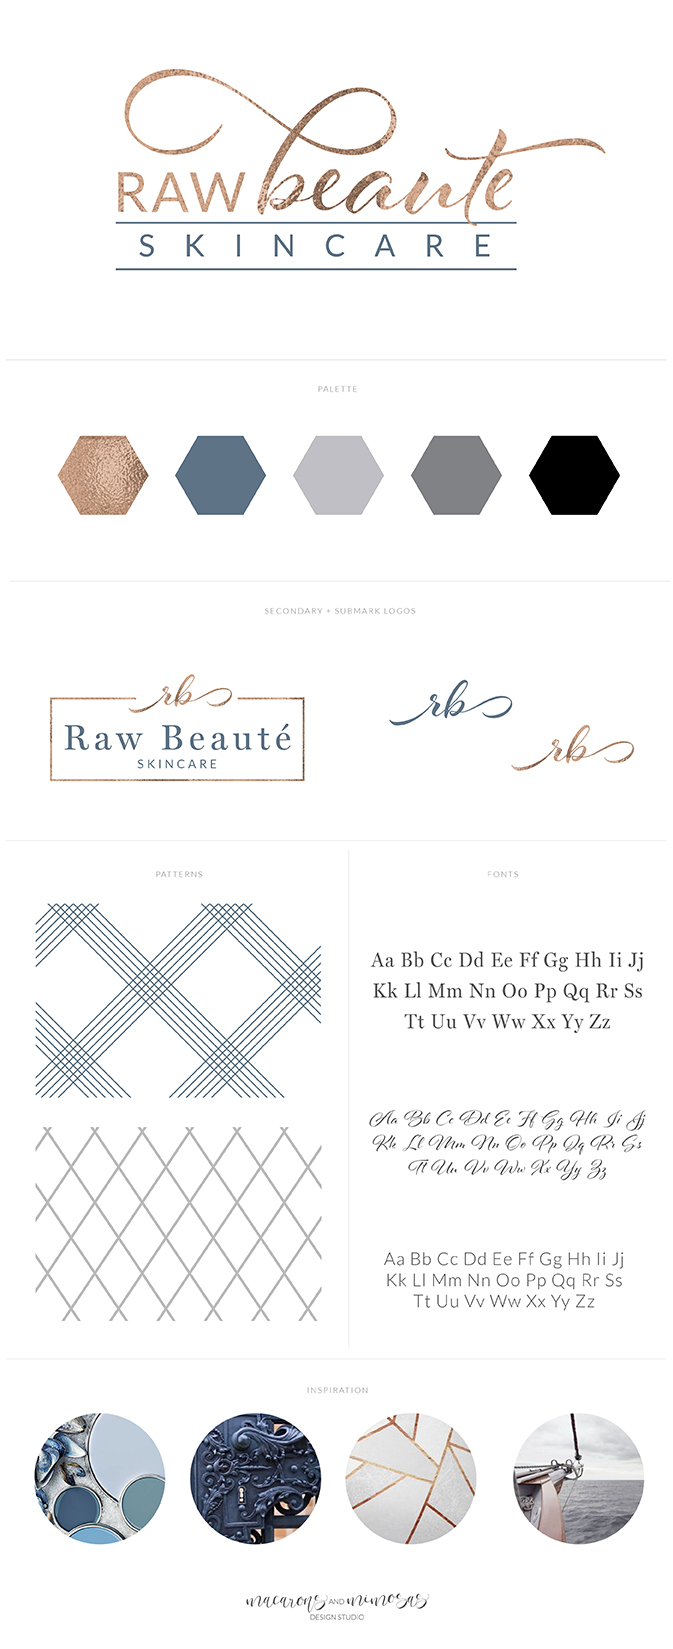 skincare logo branding, blue copper navy brand board, health and wellness logo, spa logo